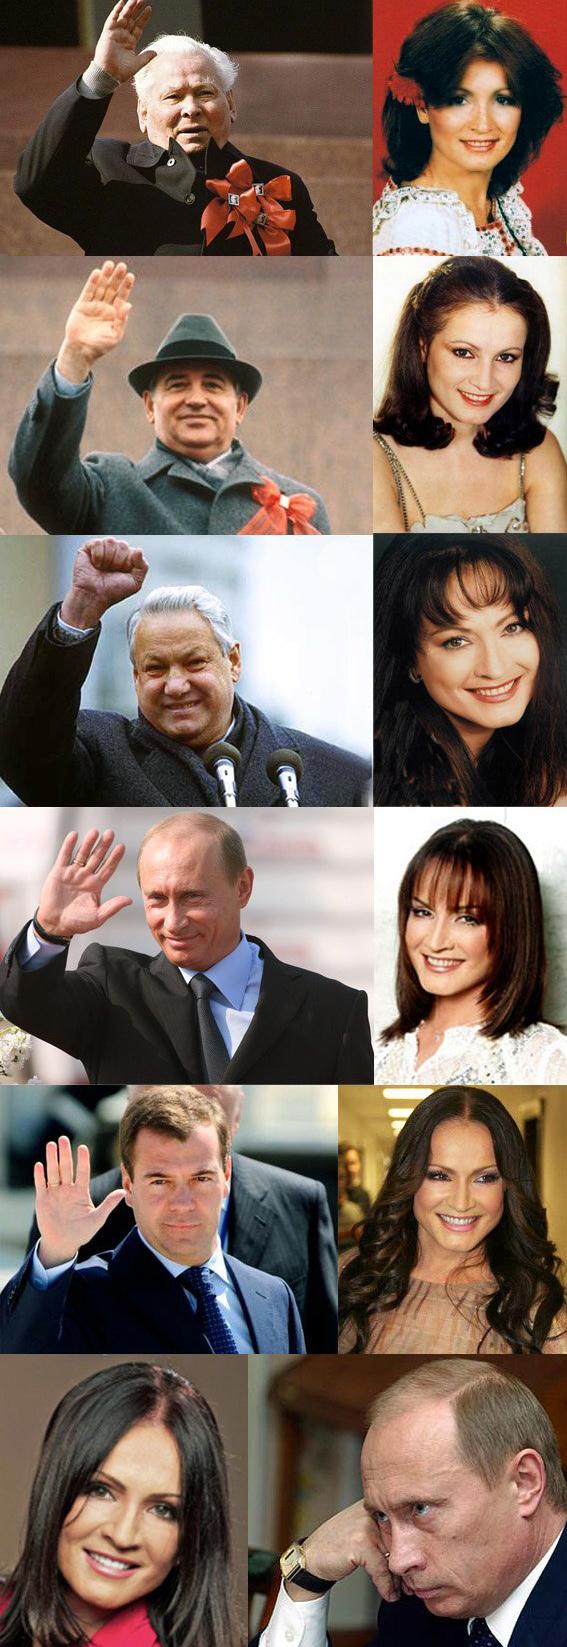 http://img-fotki.yandex.ru/get/4420/130422193.68/0_6d5cc_15a11221_orig